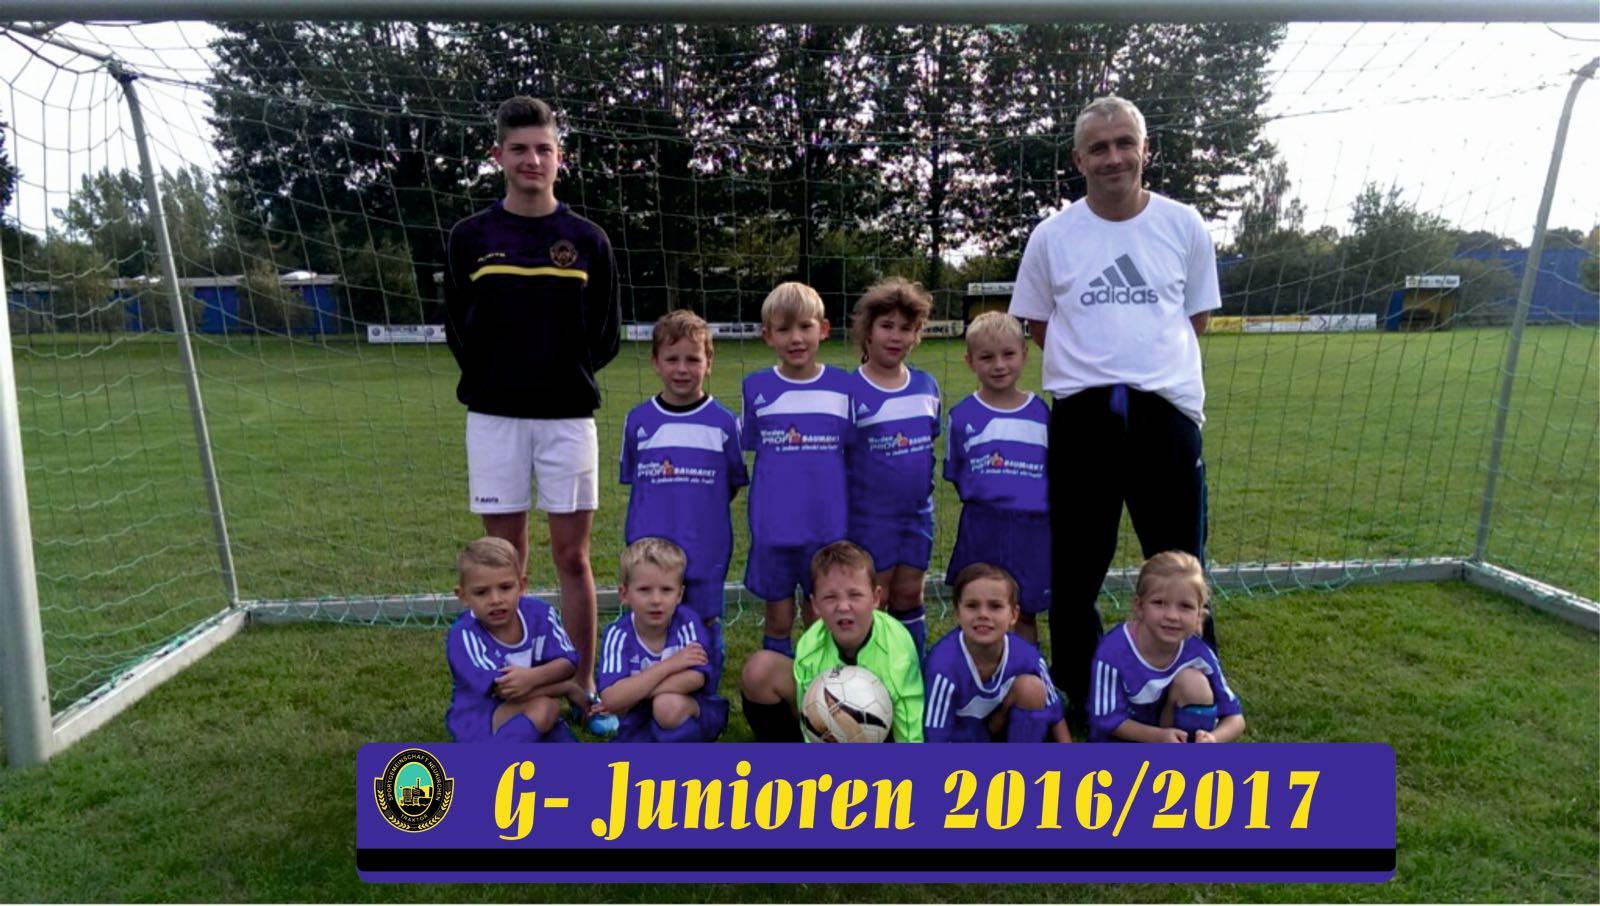 g-junioren-2016-17